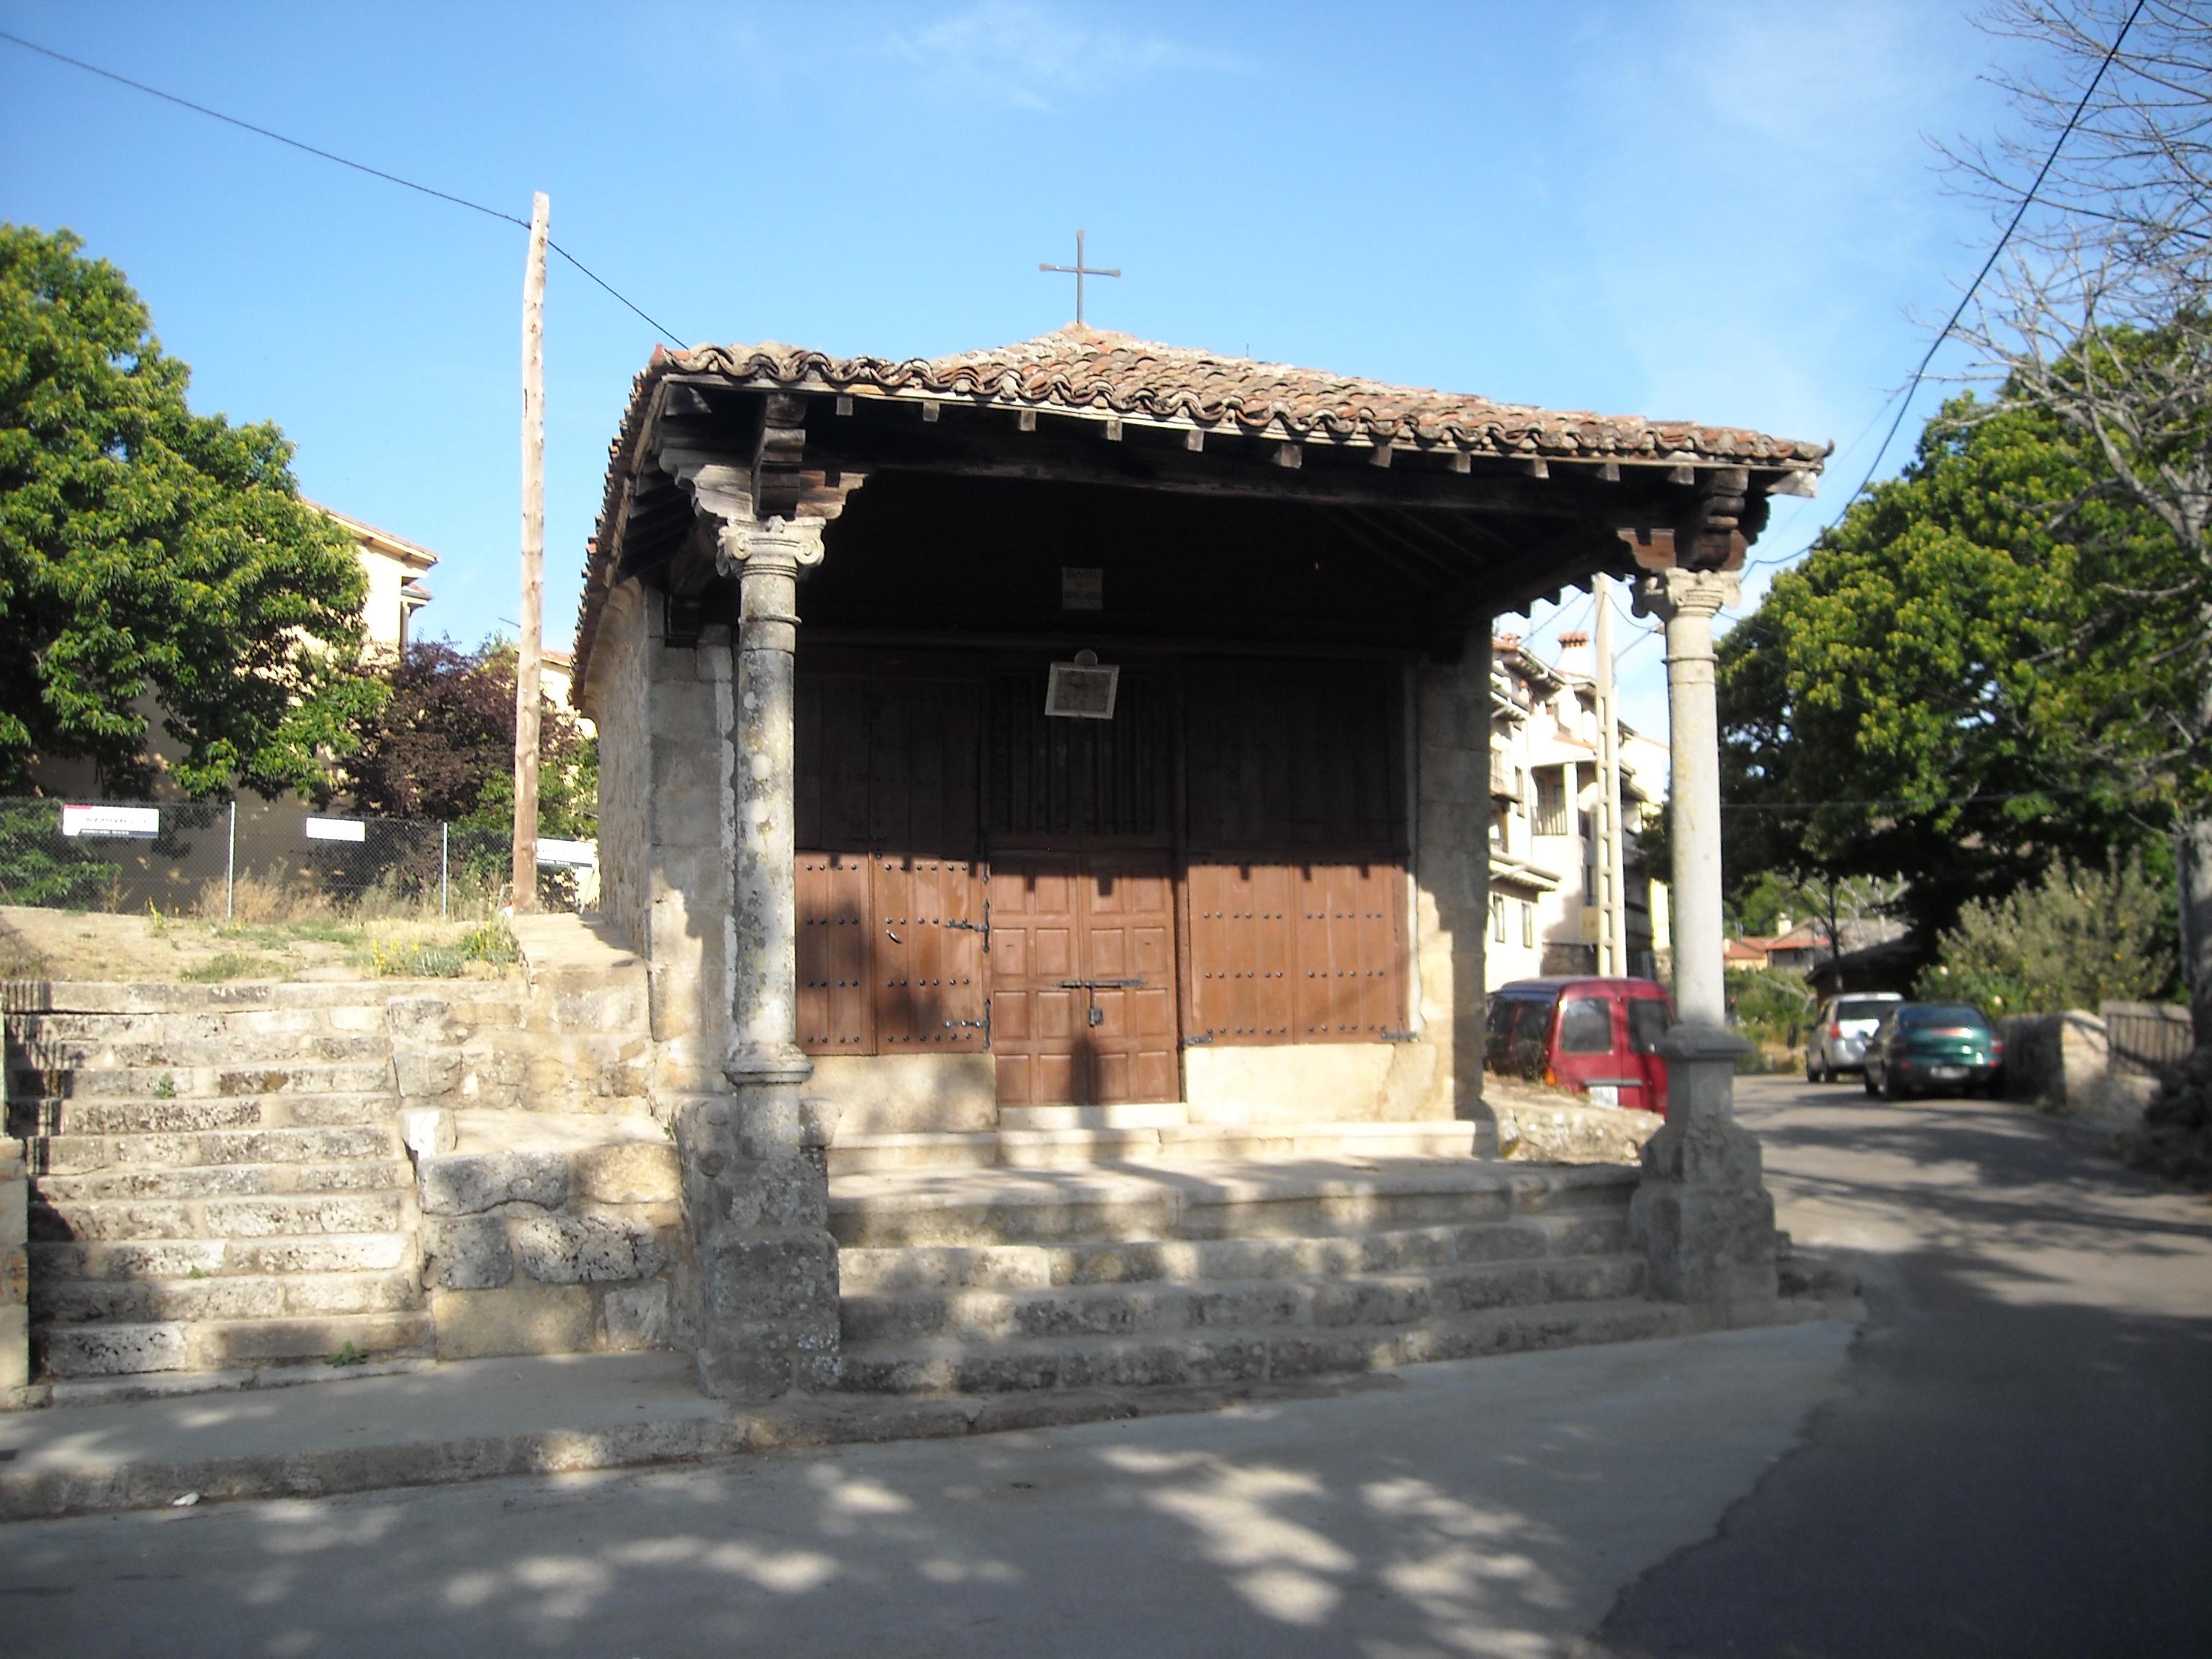 http://upload.wikimedia.org/wikipedia/commons/b/b2/Ermita_del_Humilladero%2C_La_Alberca.JPG